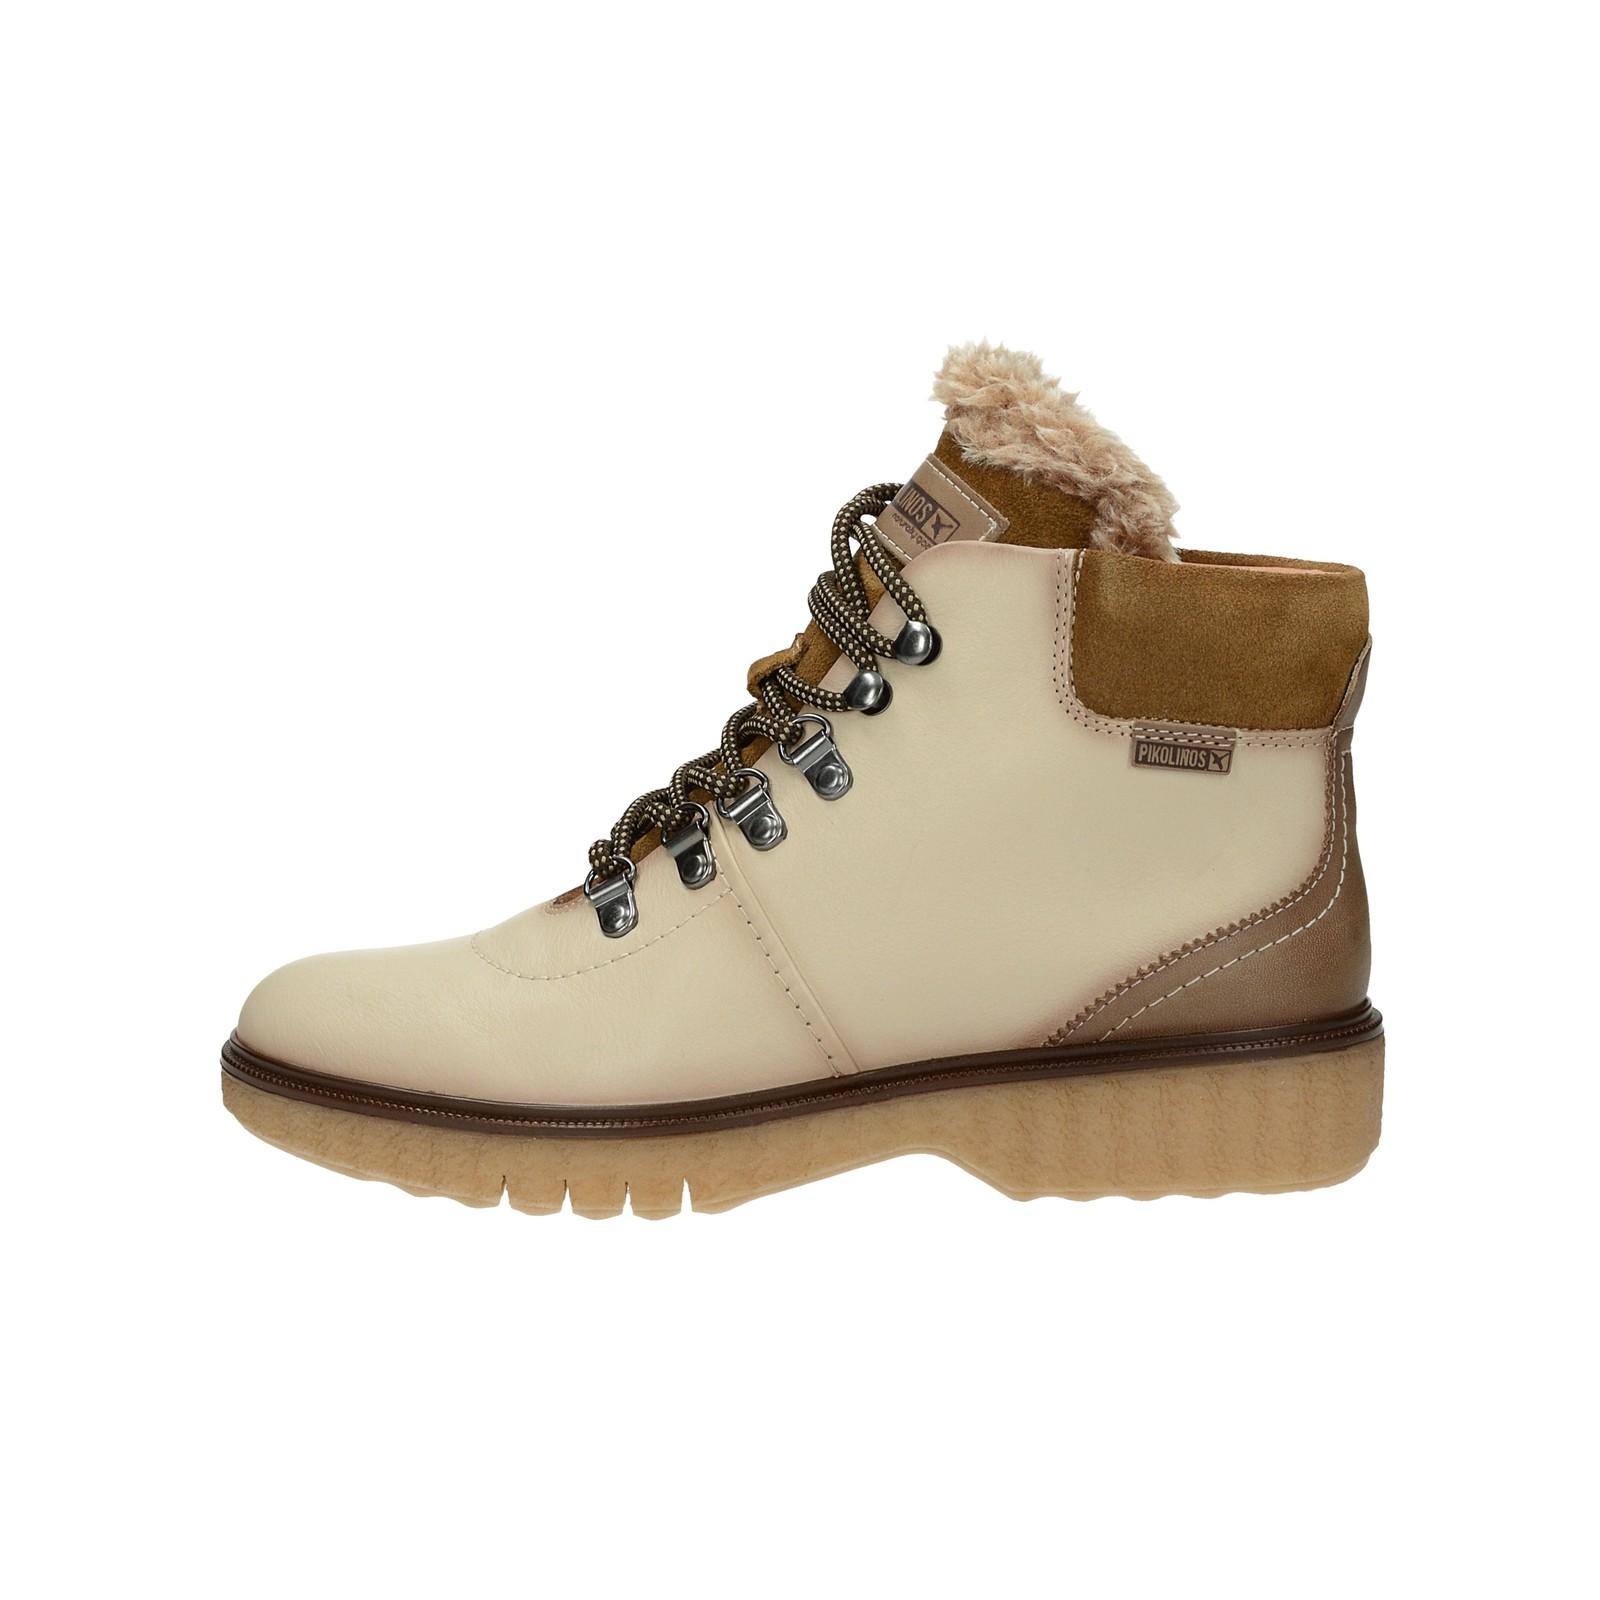 3b8040e945f ... Pikolinos dámské kožené kotníkové boty - béžové ...